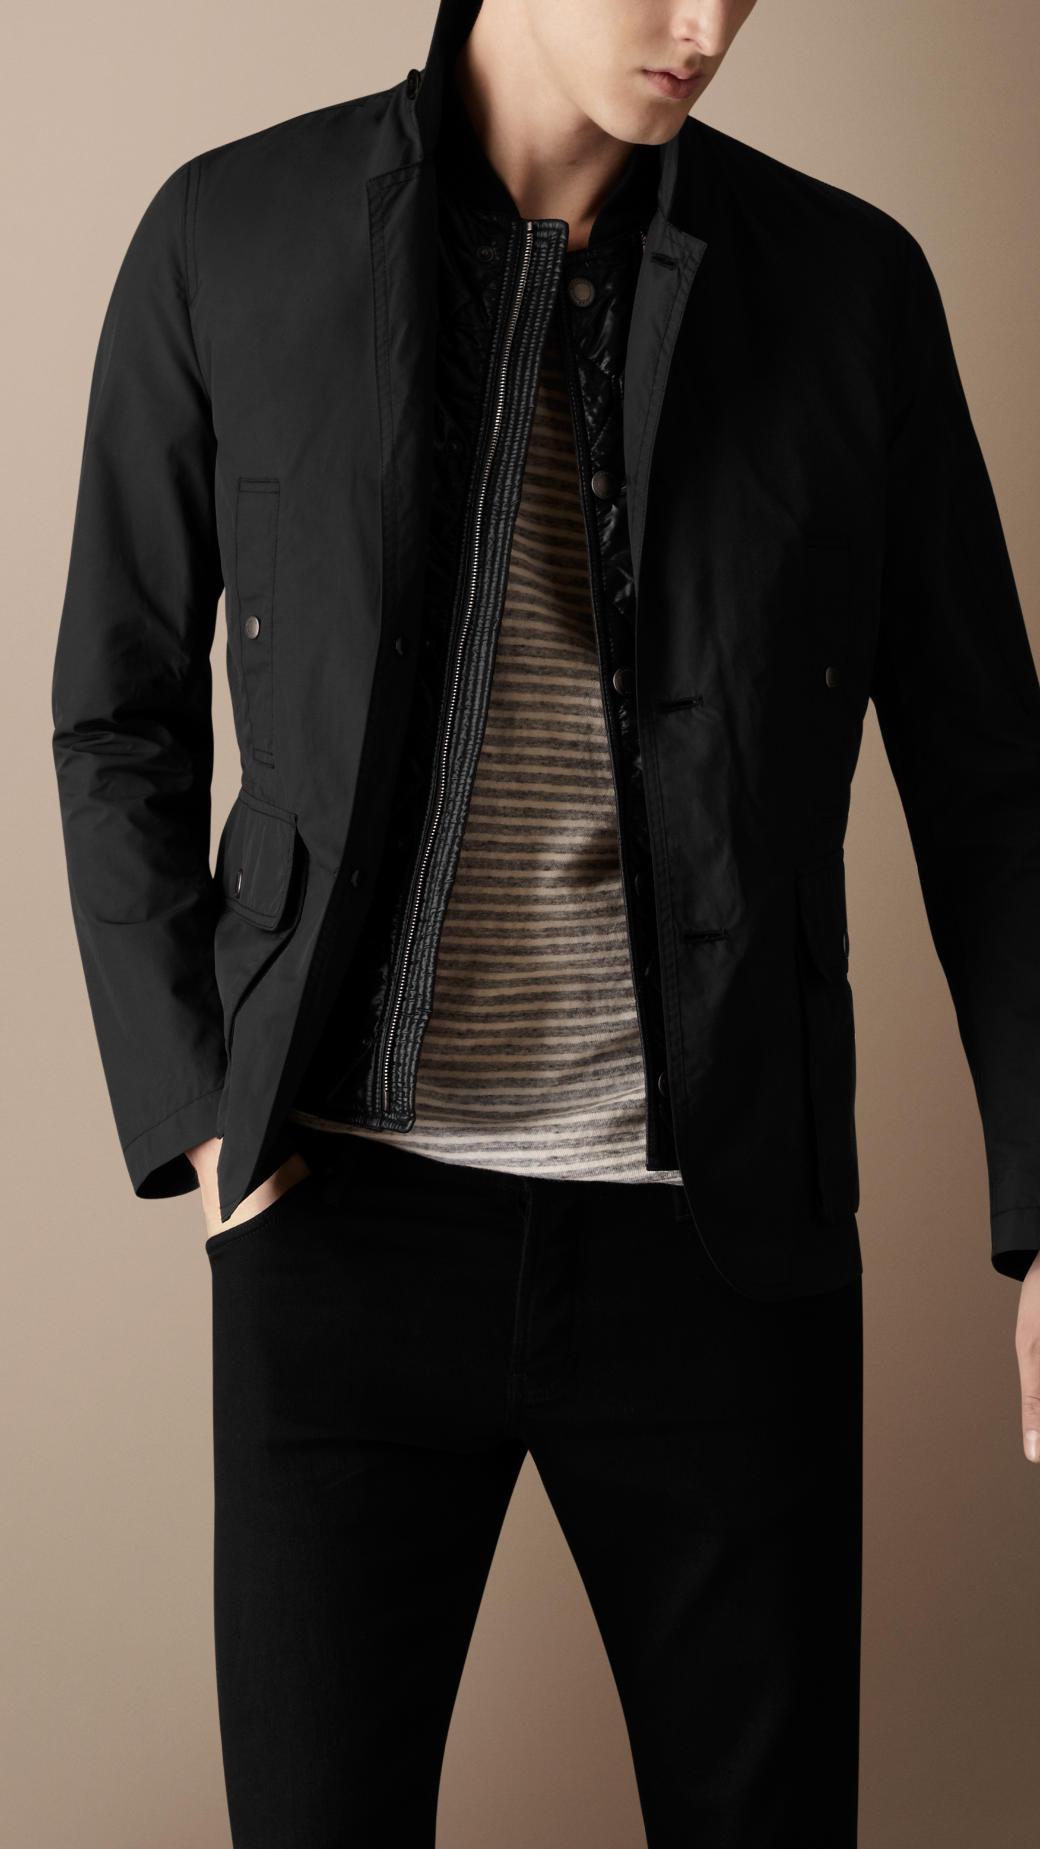 burberry brit showerproof nylon cotton coat in black for men lyst. Black Bedroom Furniture Sets. Home Design Ideas